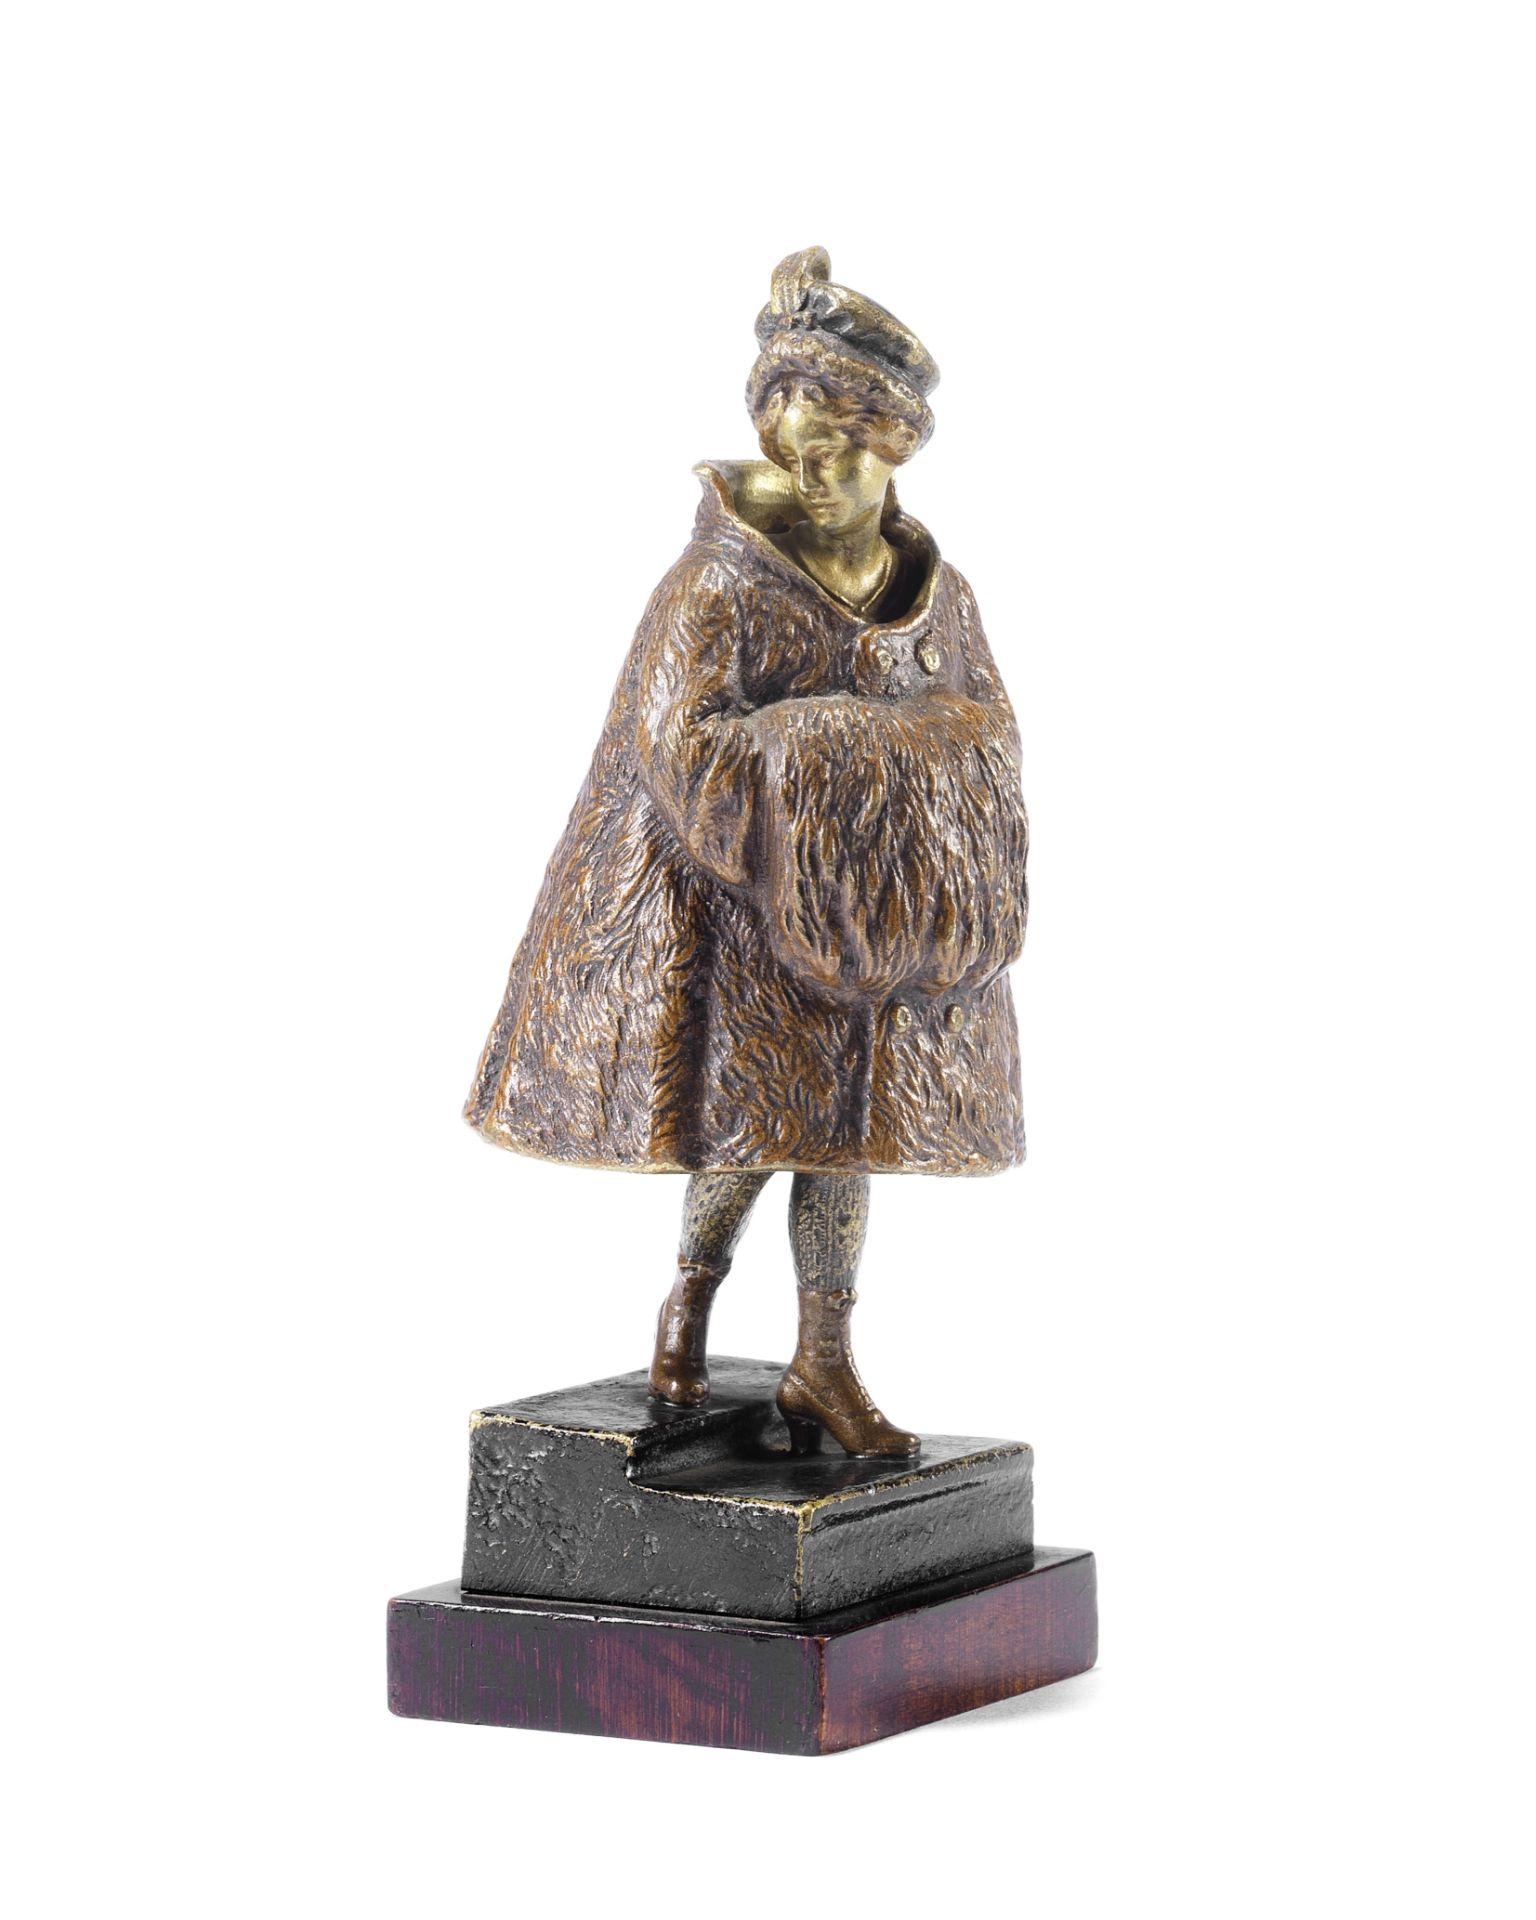 Franz Bergman (Austrian, 1861-1936): An unusual cold painted bronze metamorphic female figure of ... - Image 2 of 2